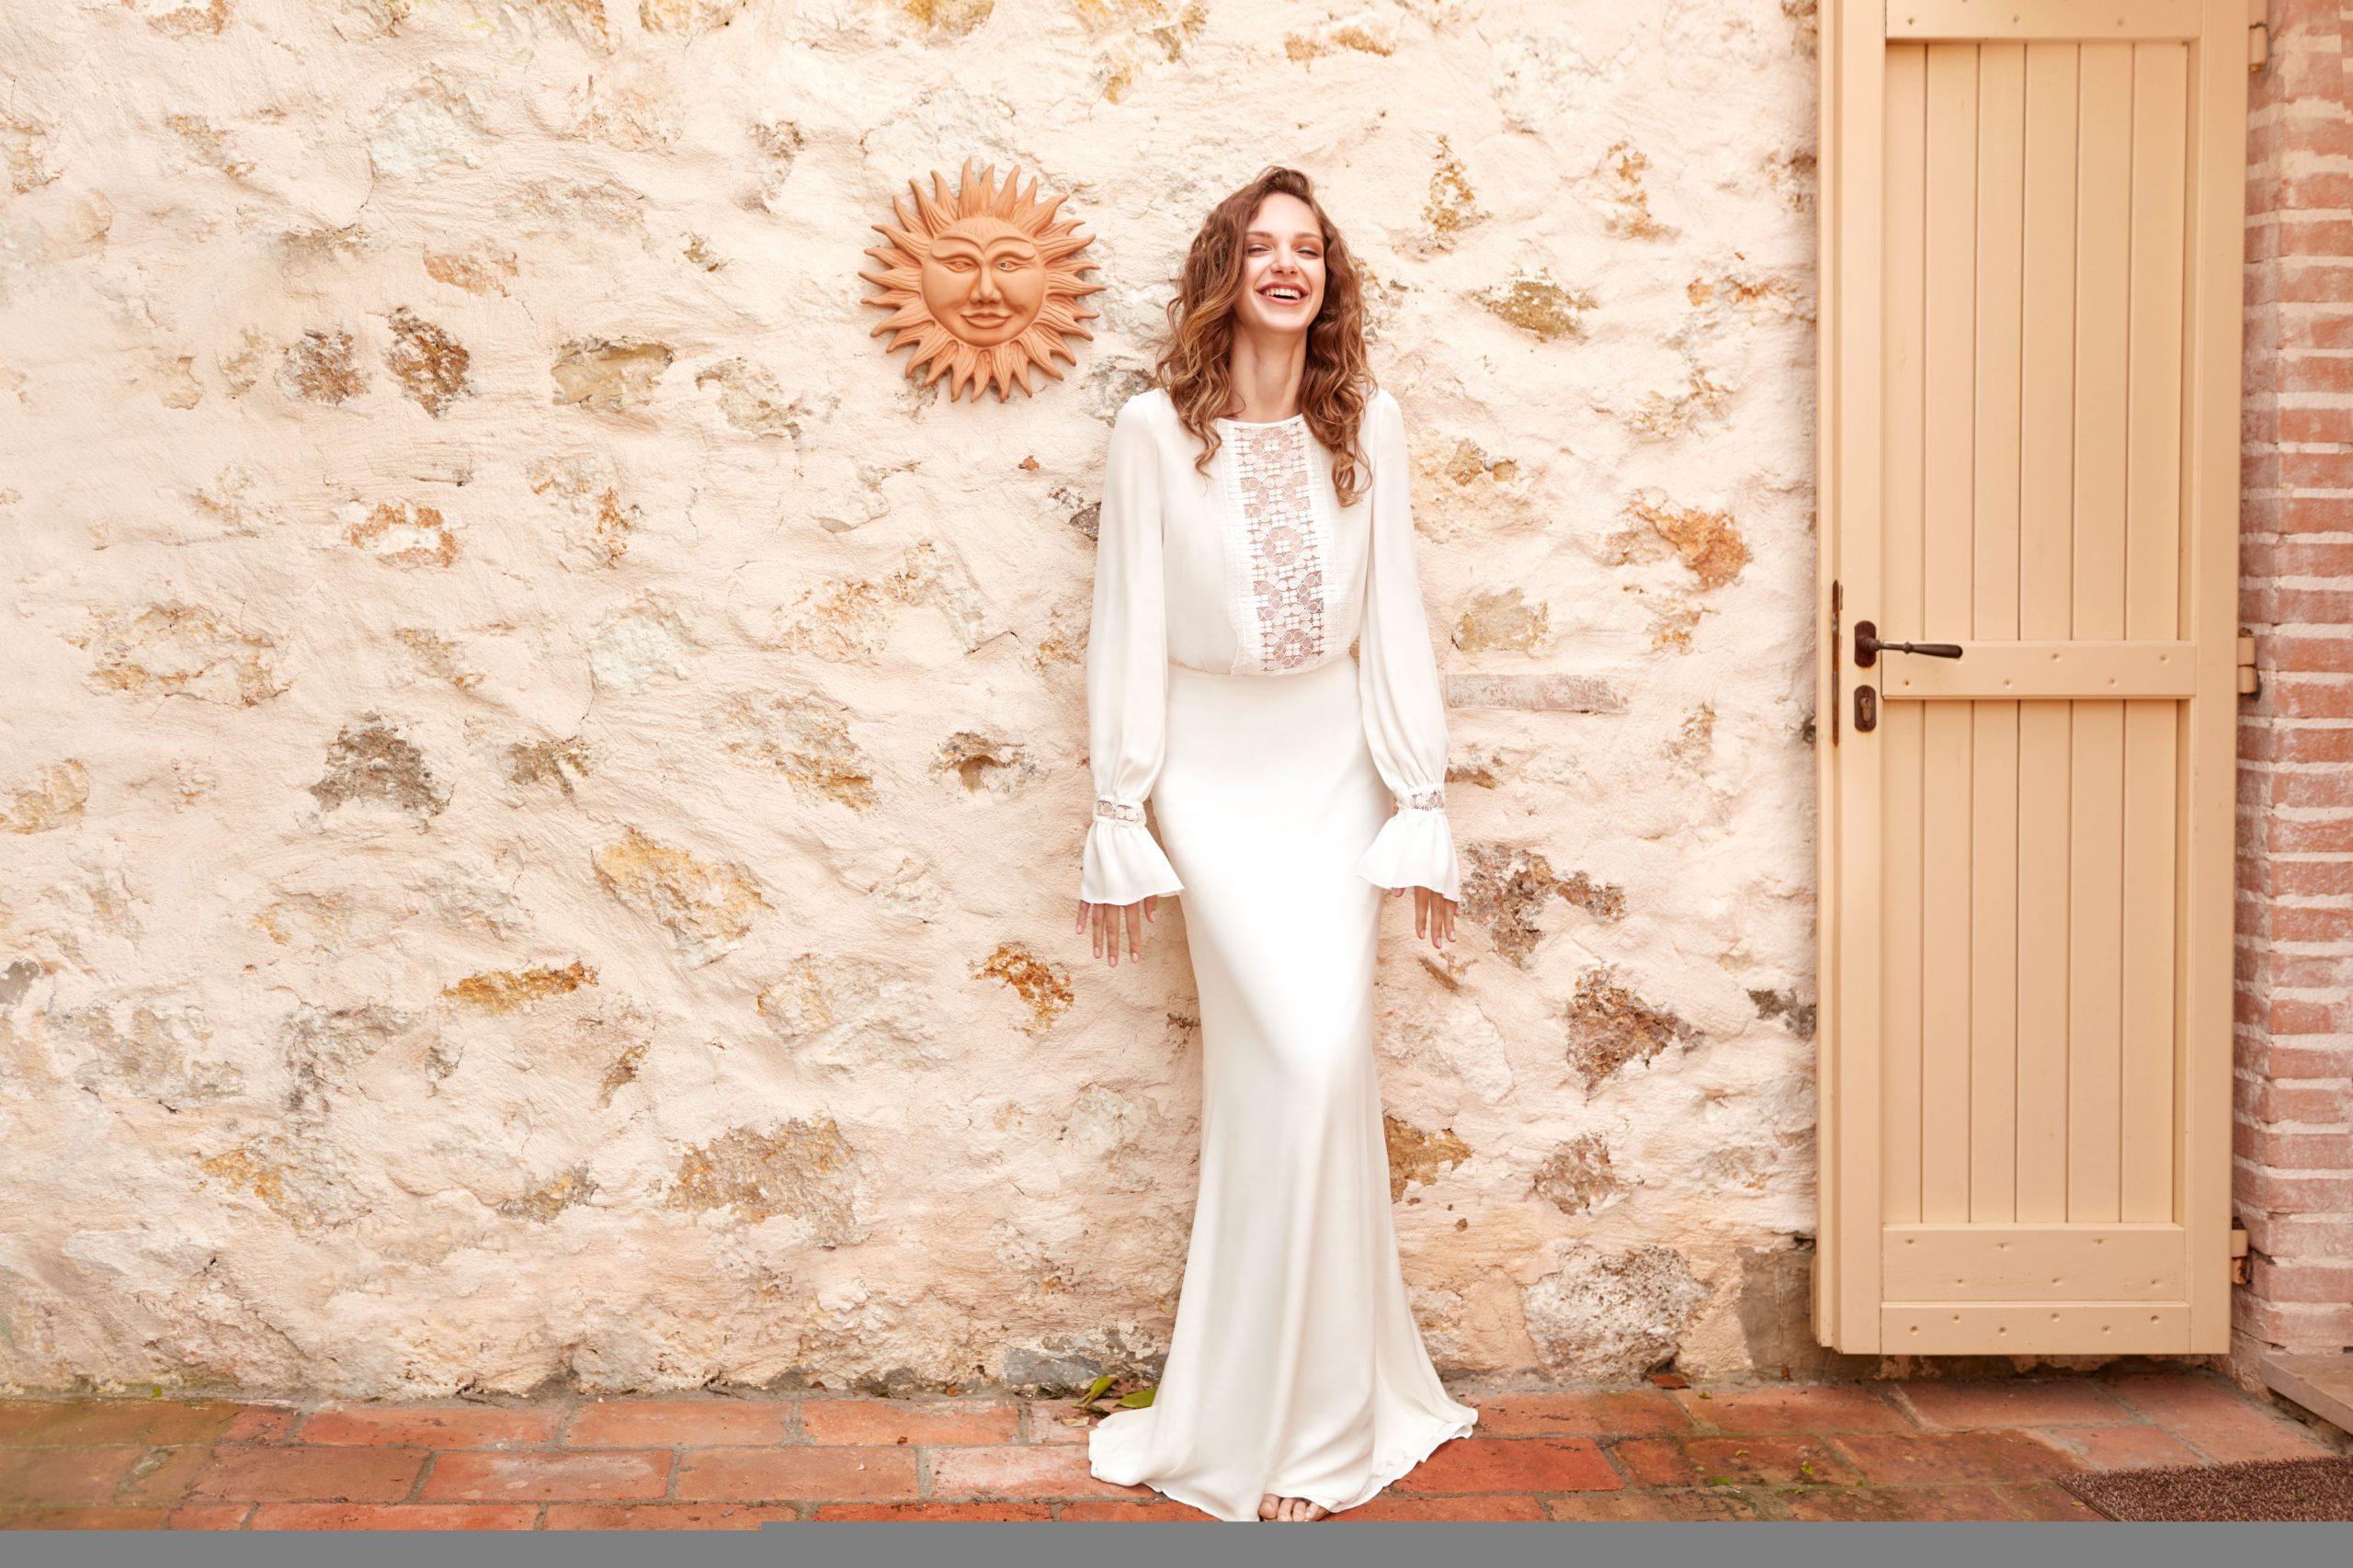 suknie ślubne - anna kara - moda ślubna